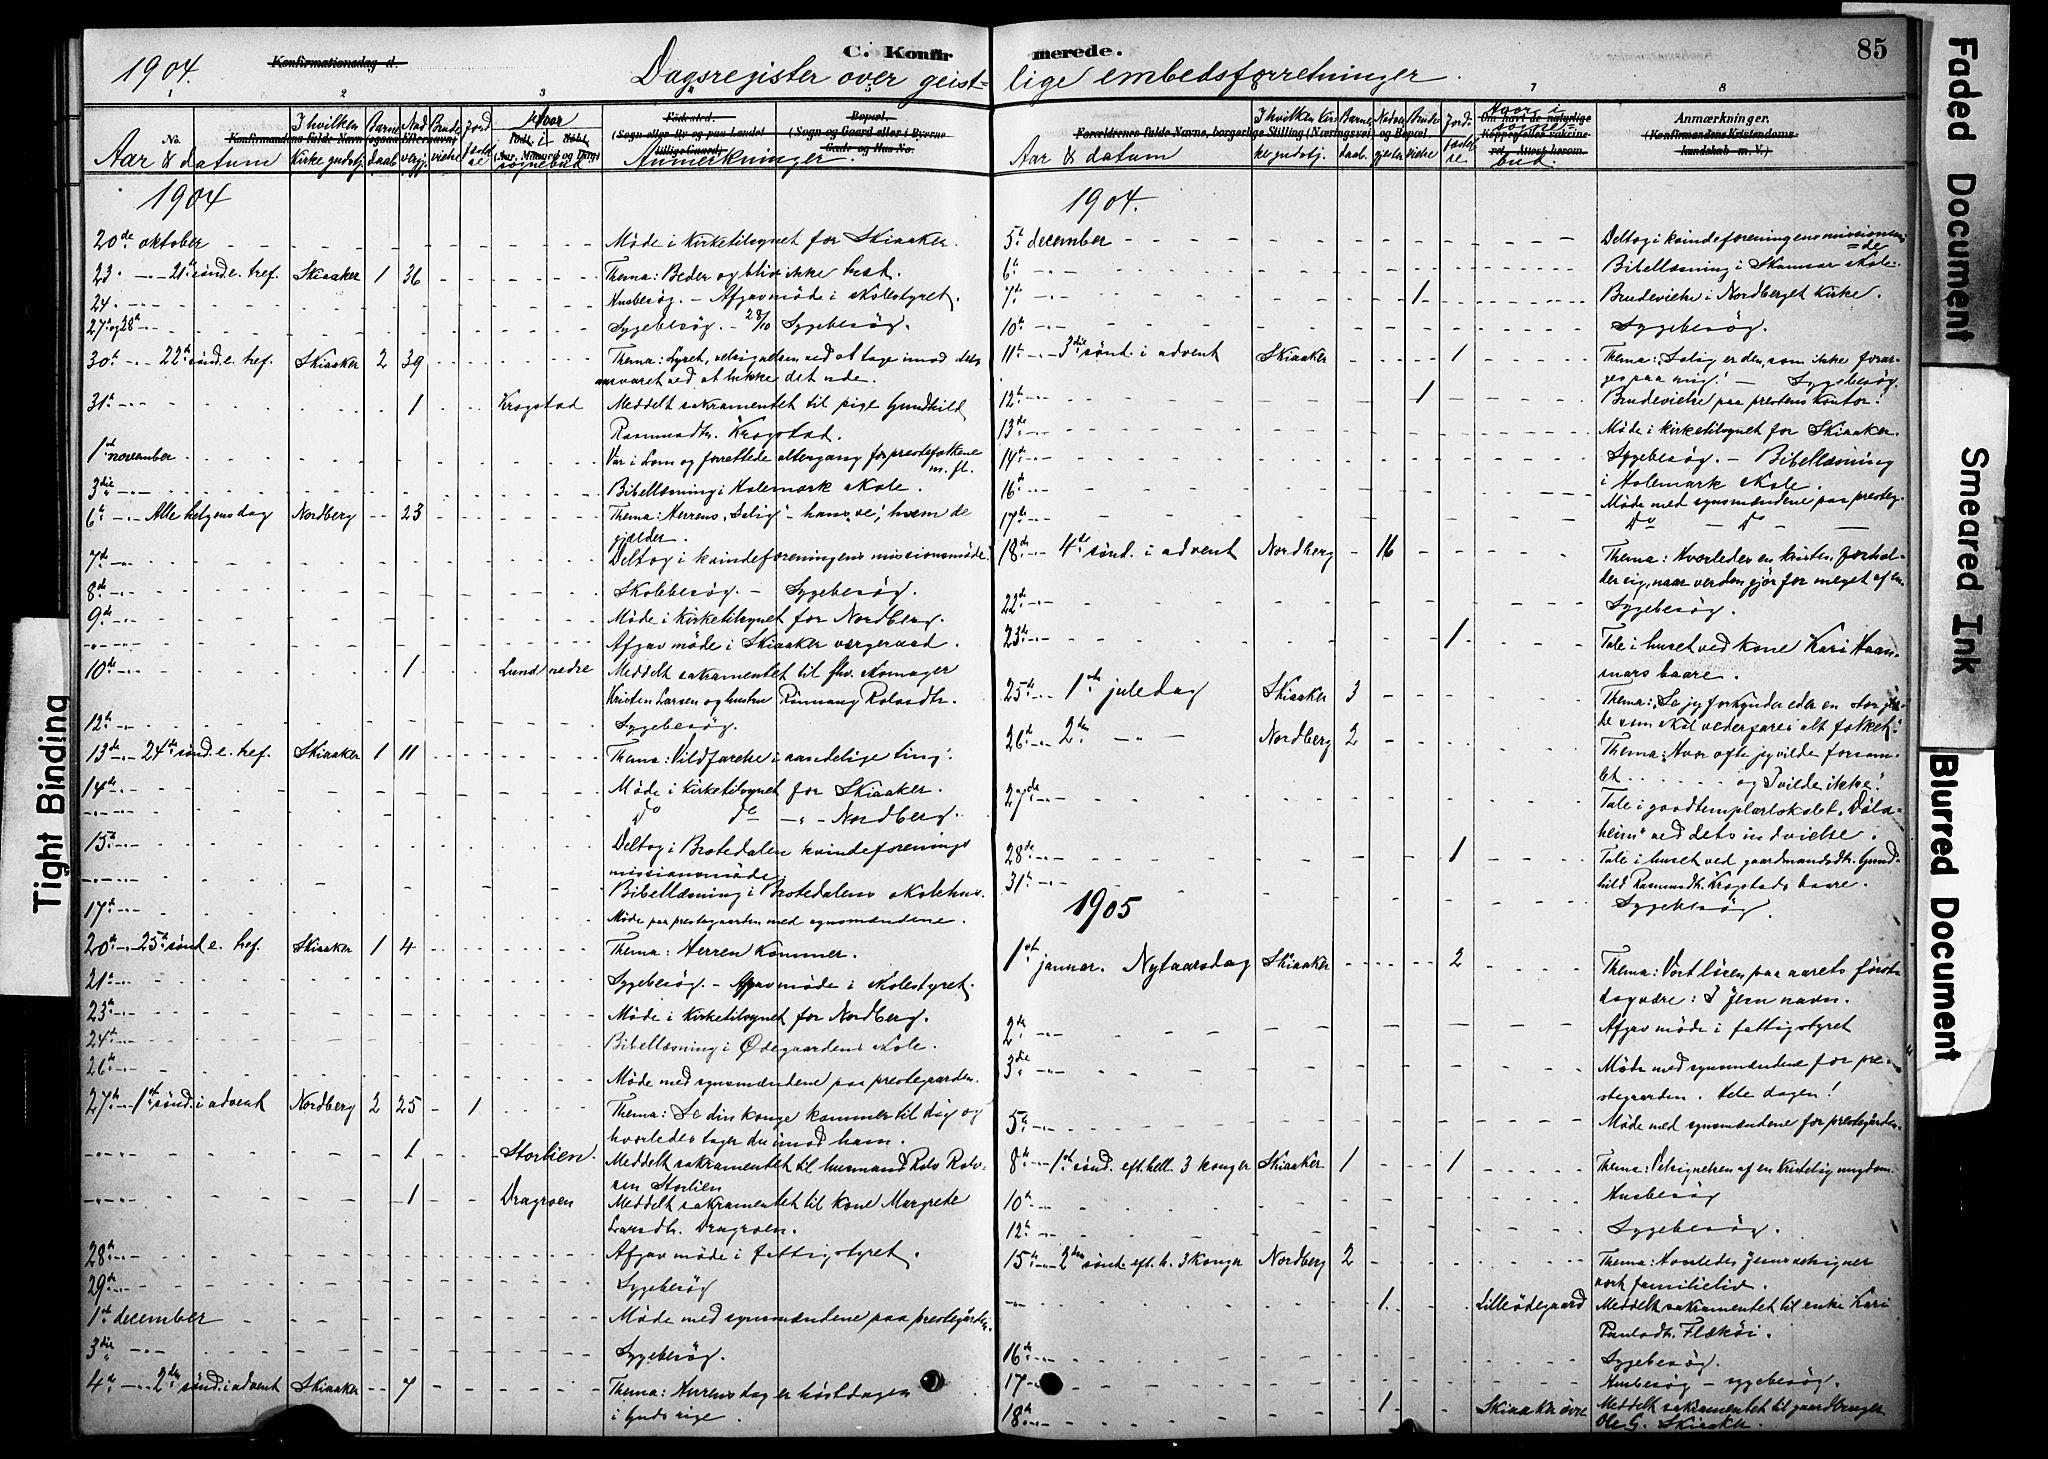 SAH, Skjåk prestekontor, Ministerialbok nr. 2, 1878-1907, s. 85